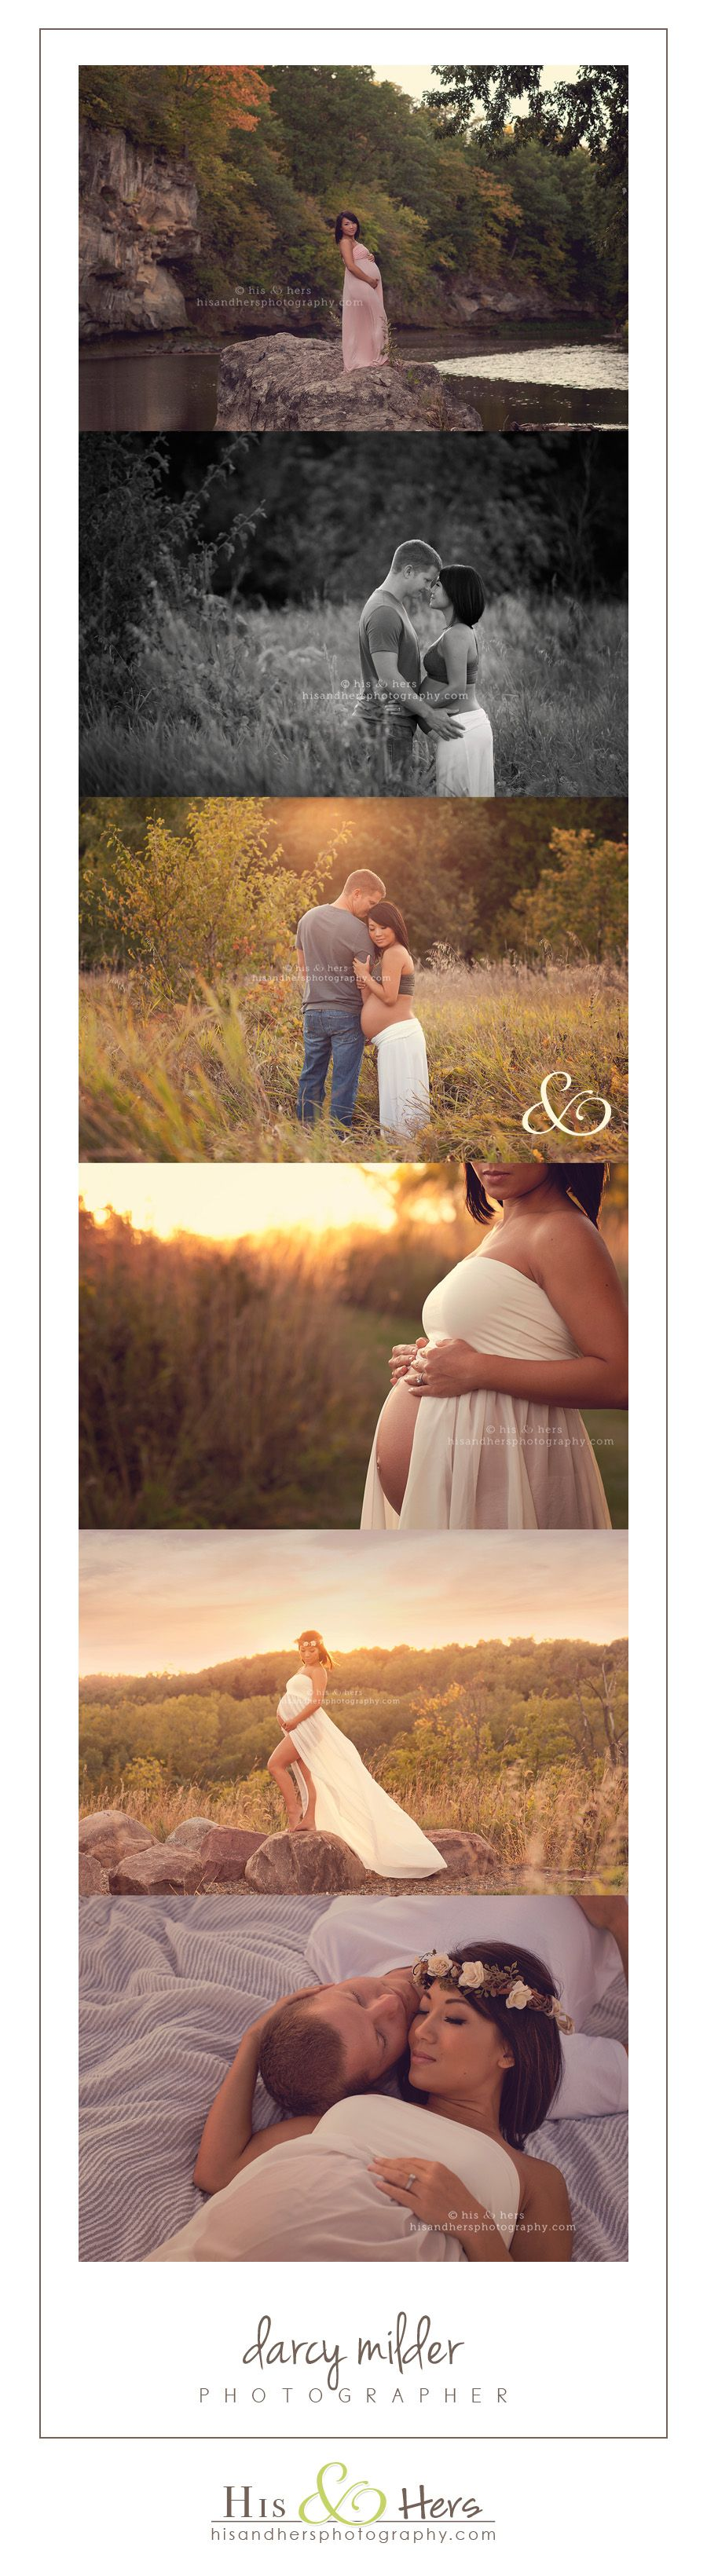 Maternity | Marcella + Dan